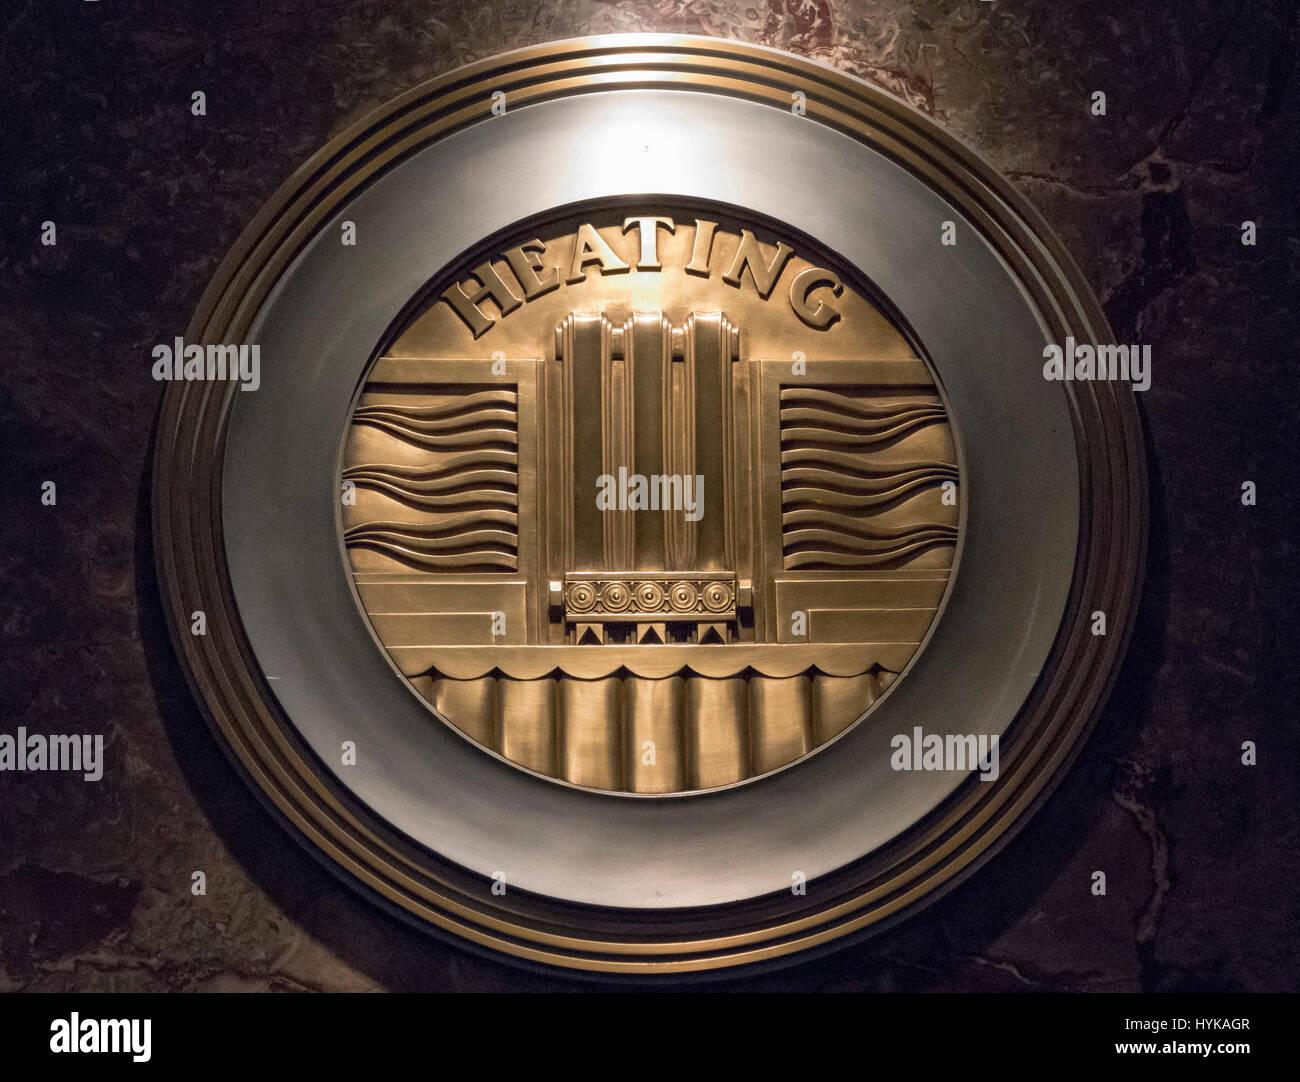 heating emblem, lobby, Empire State Building, Manhattan, New York City, USA - Stock Image